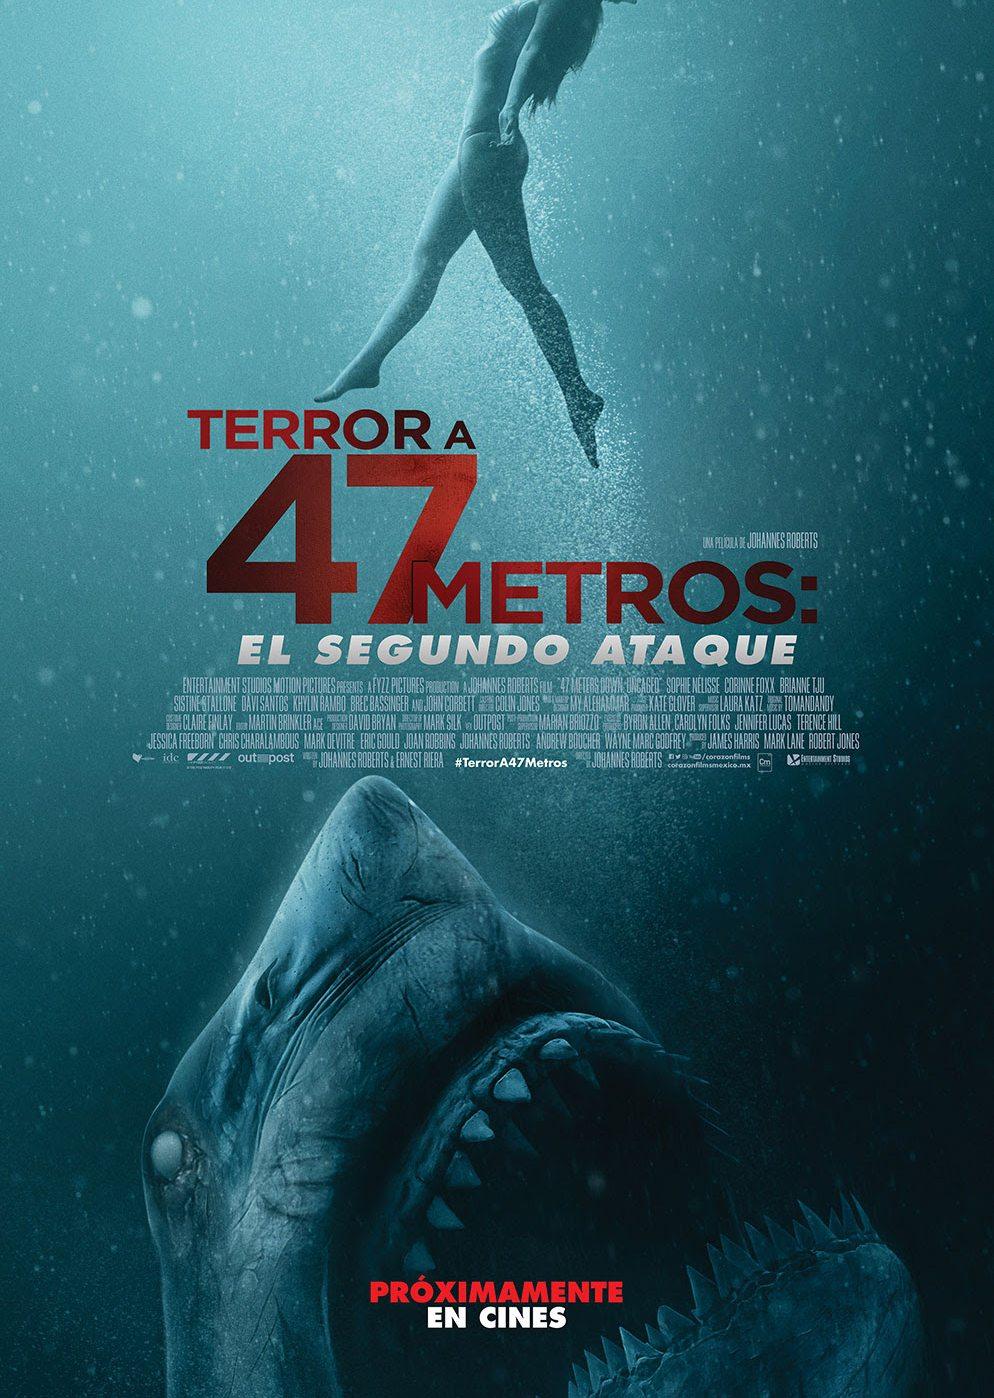 Terror a 47 metros: El segundo ataque - SensaCine.com.mx